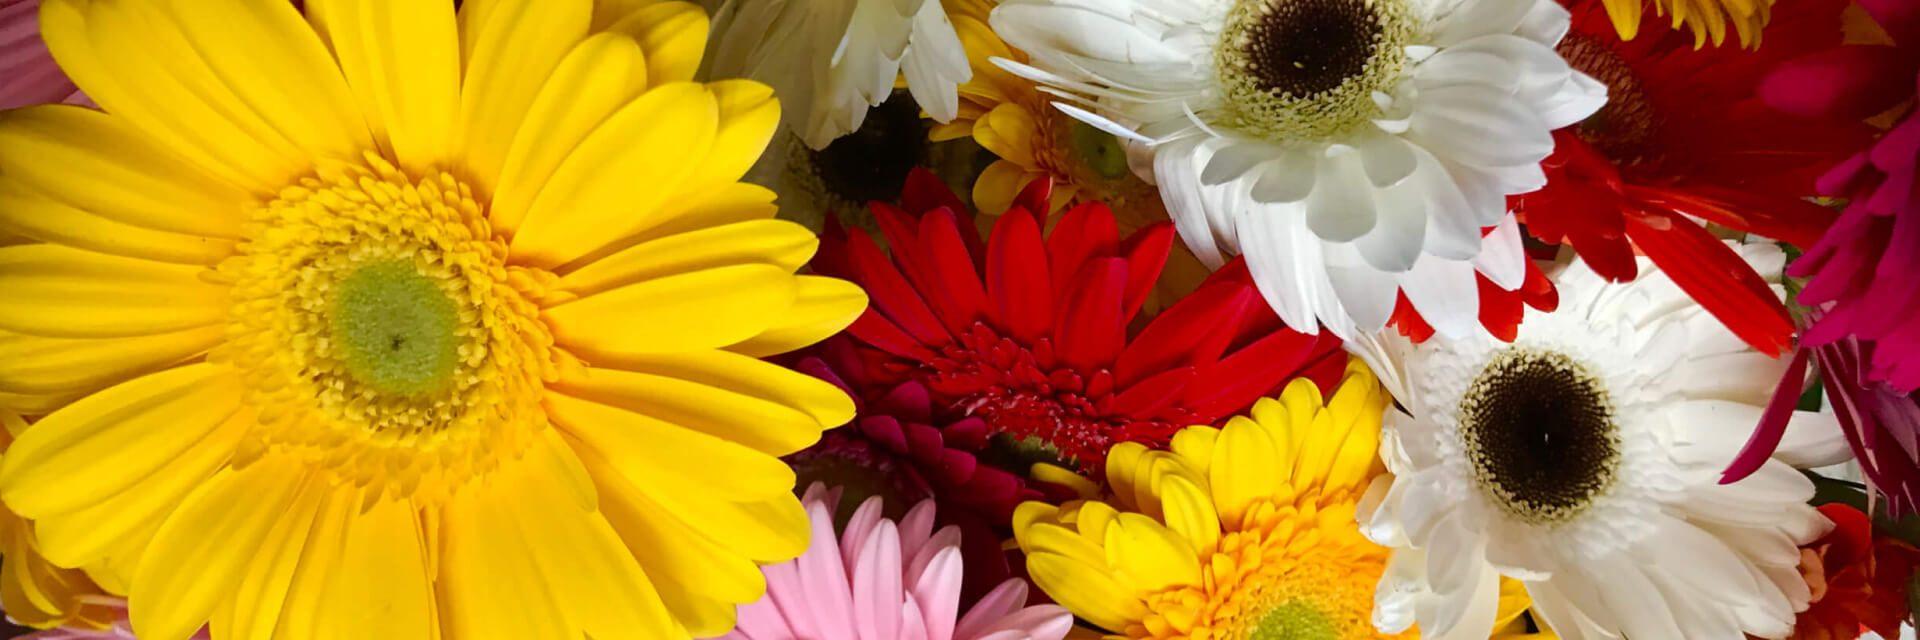 Flower arrangement up close